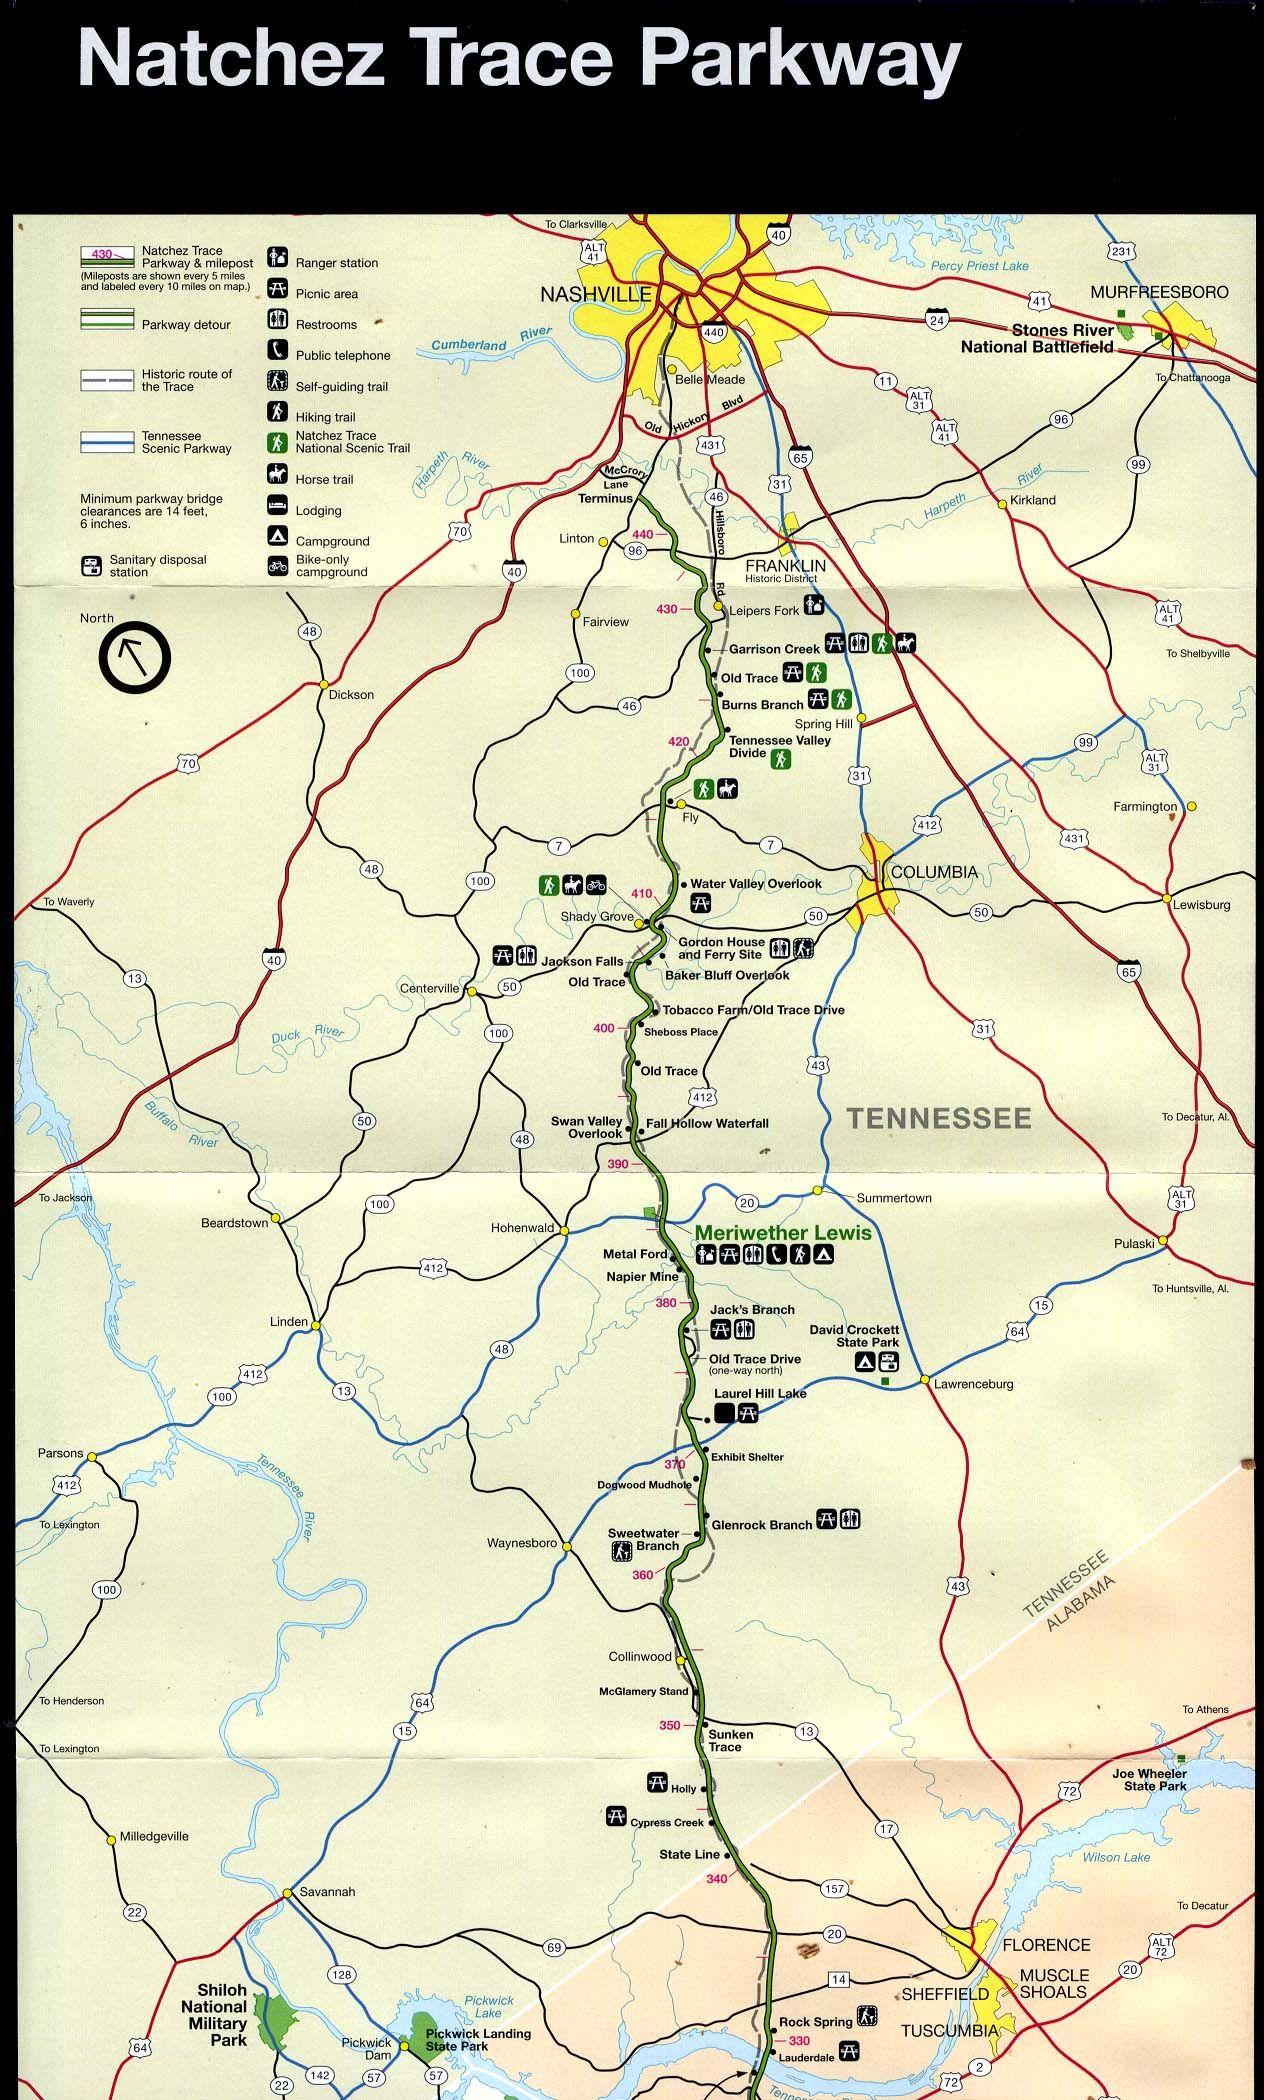 Natchez Trace Parkway Map : natchez, trace, parkway, Natchez, Trace, Parkway, Planner,, Trace,